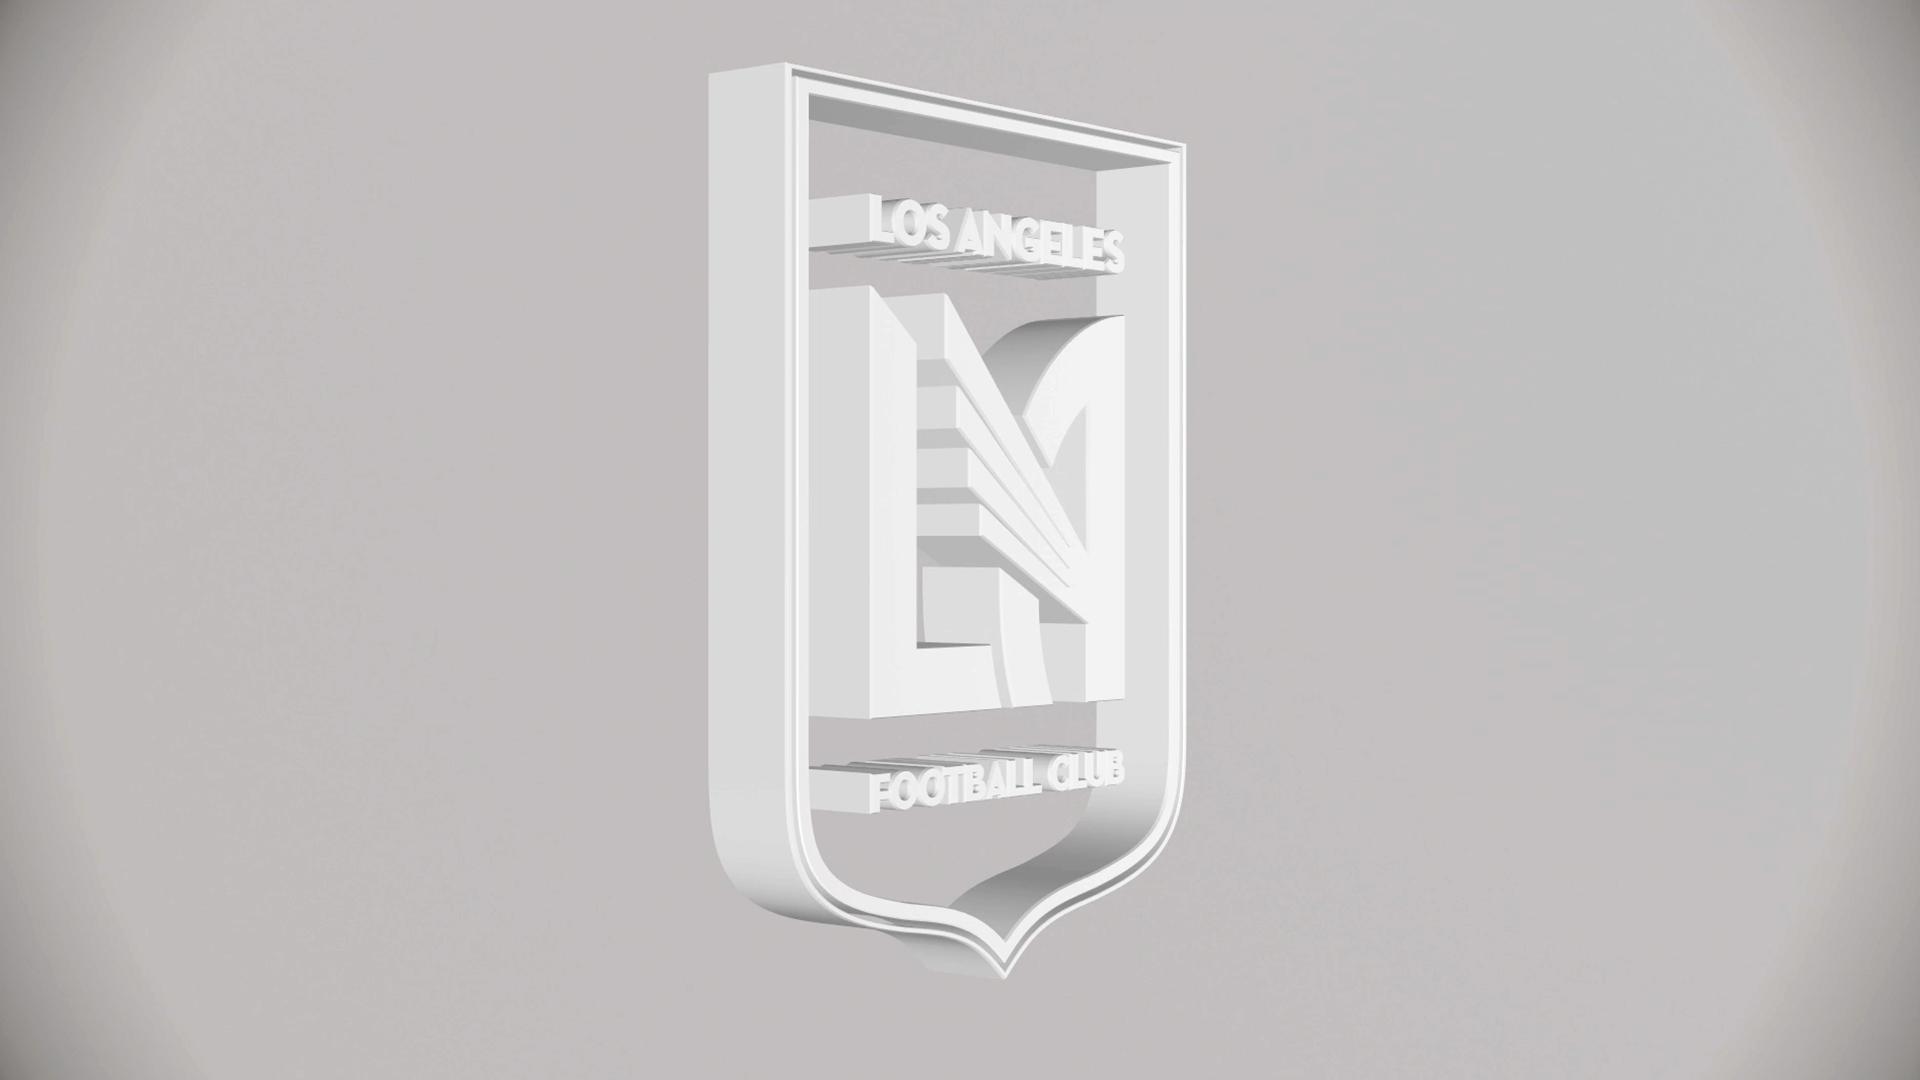 LAFC_thumbnail_02.jpg